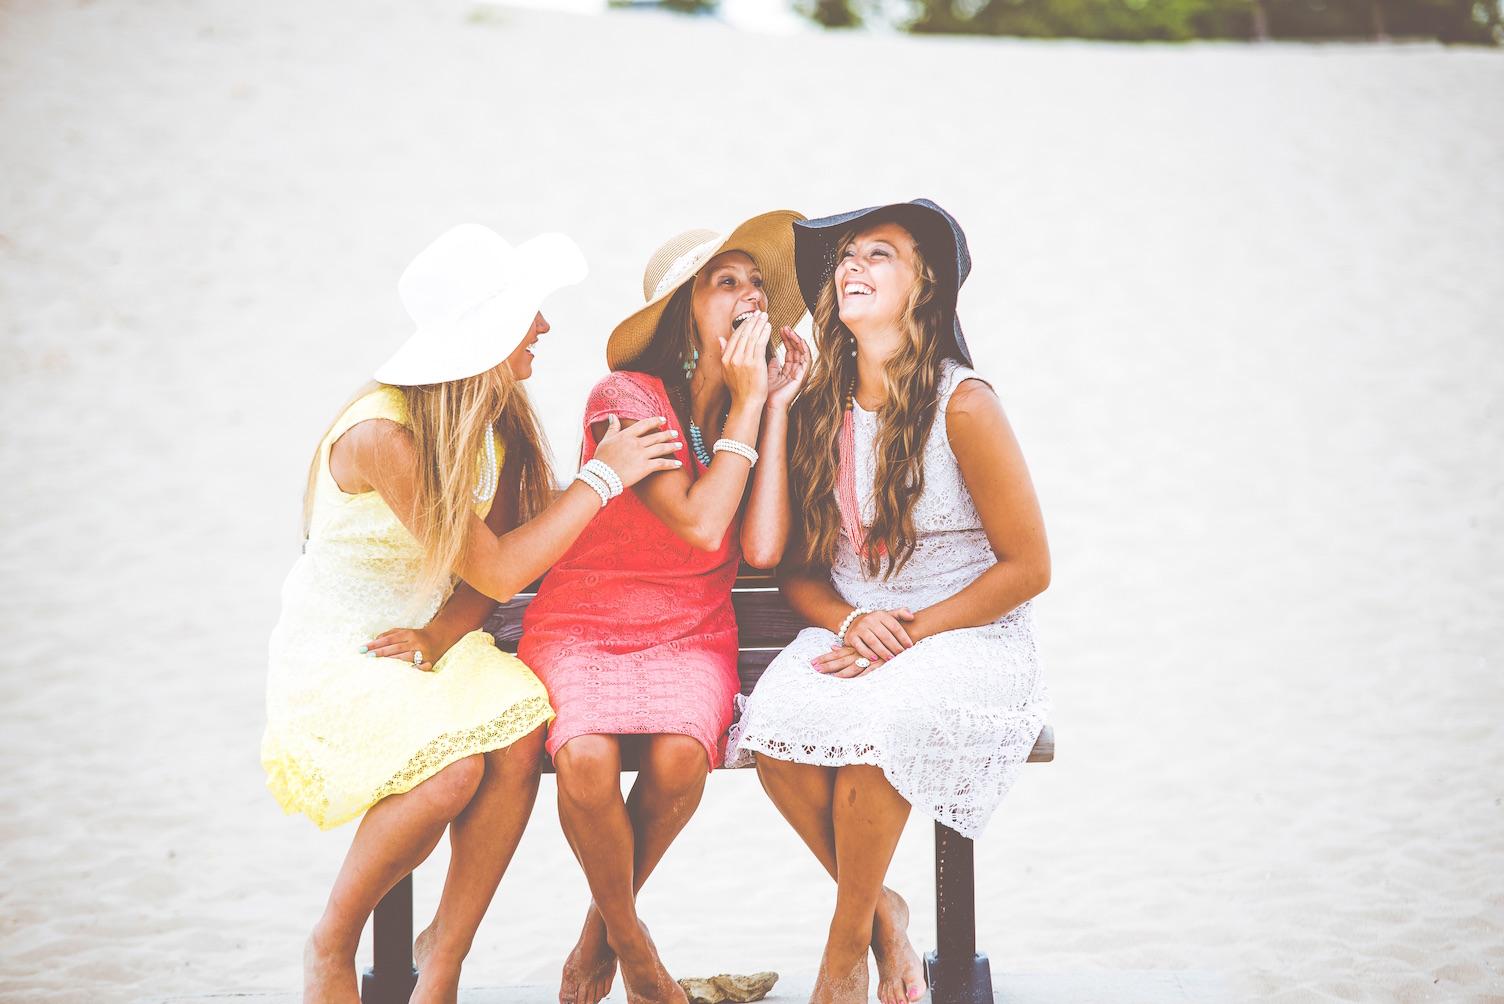 Take Amazing Group Photos